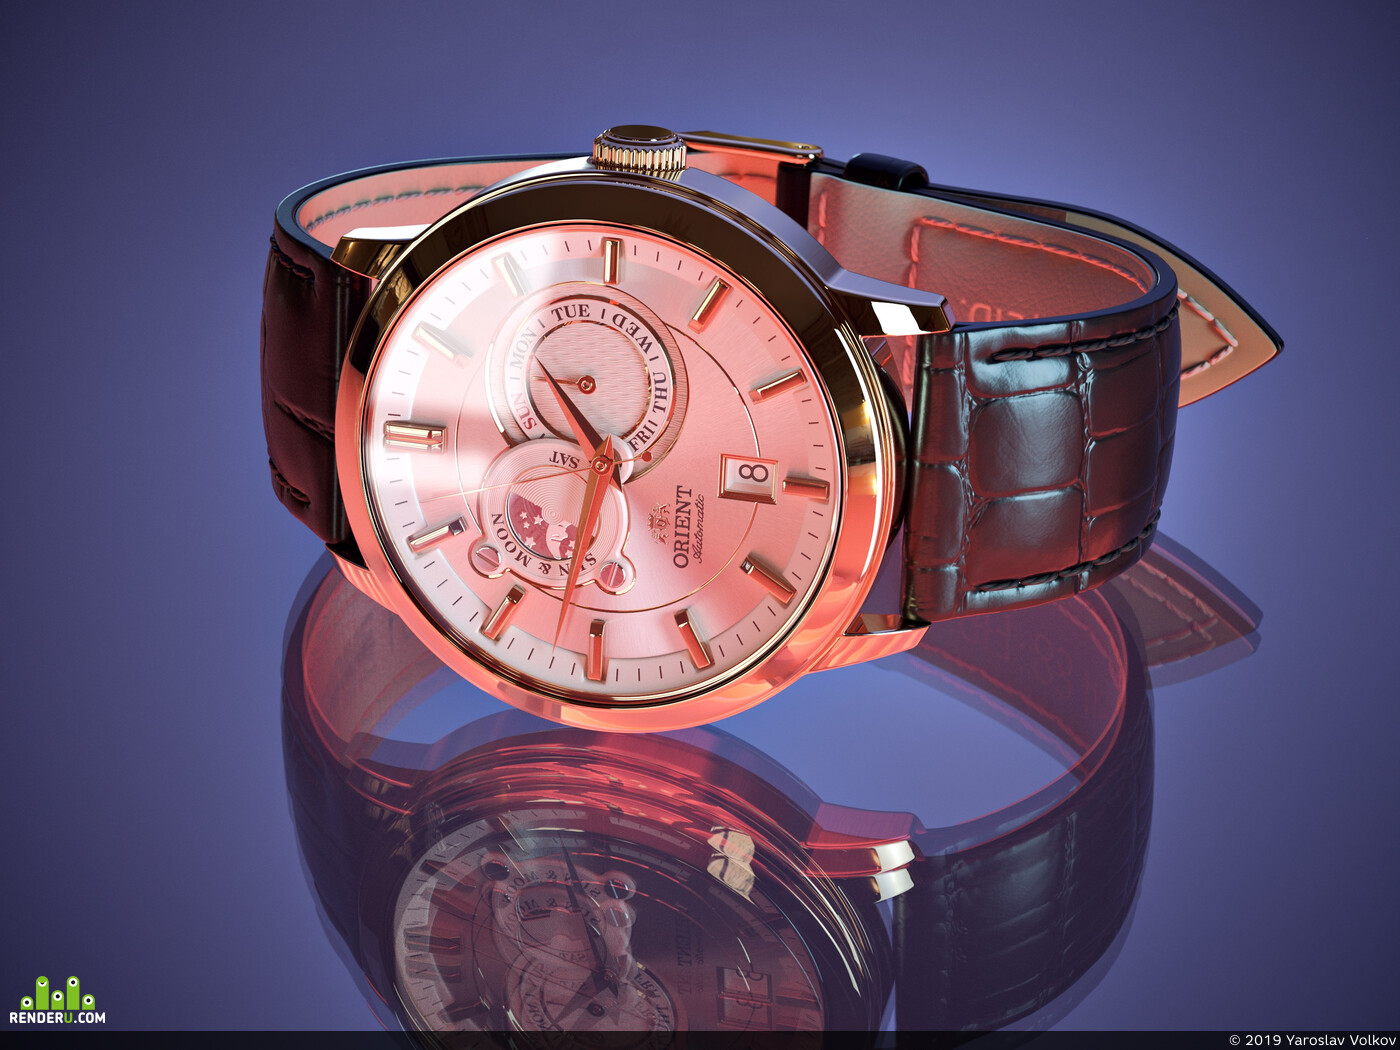 наручные часы, Предметная визуализация, Кожа, металл, механизмы